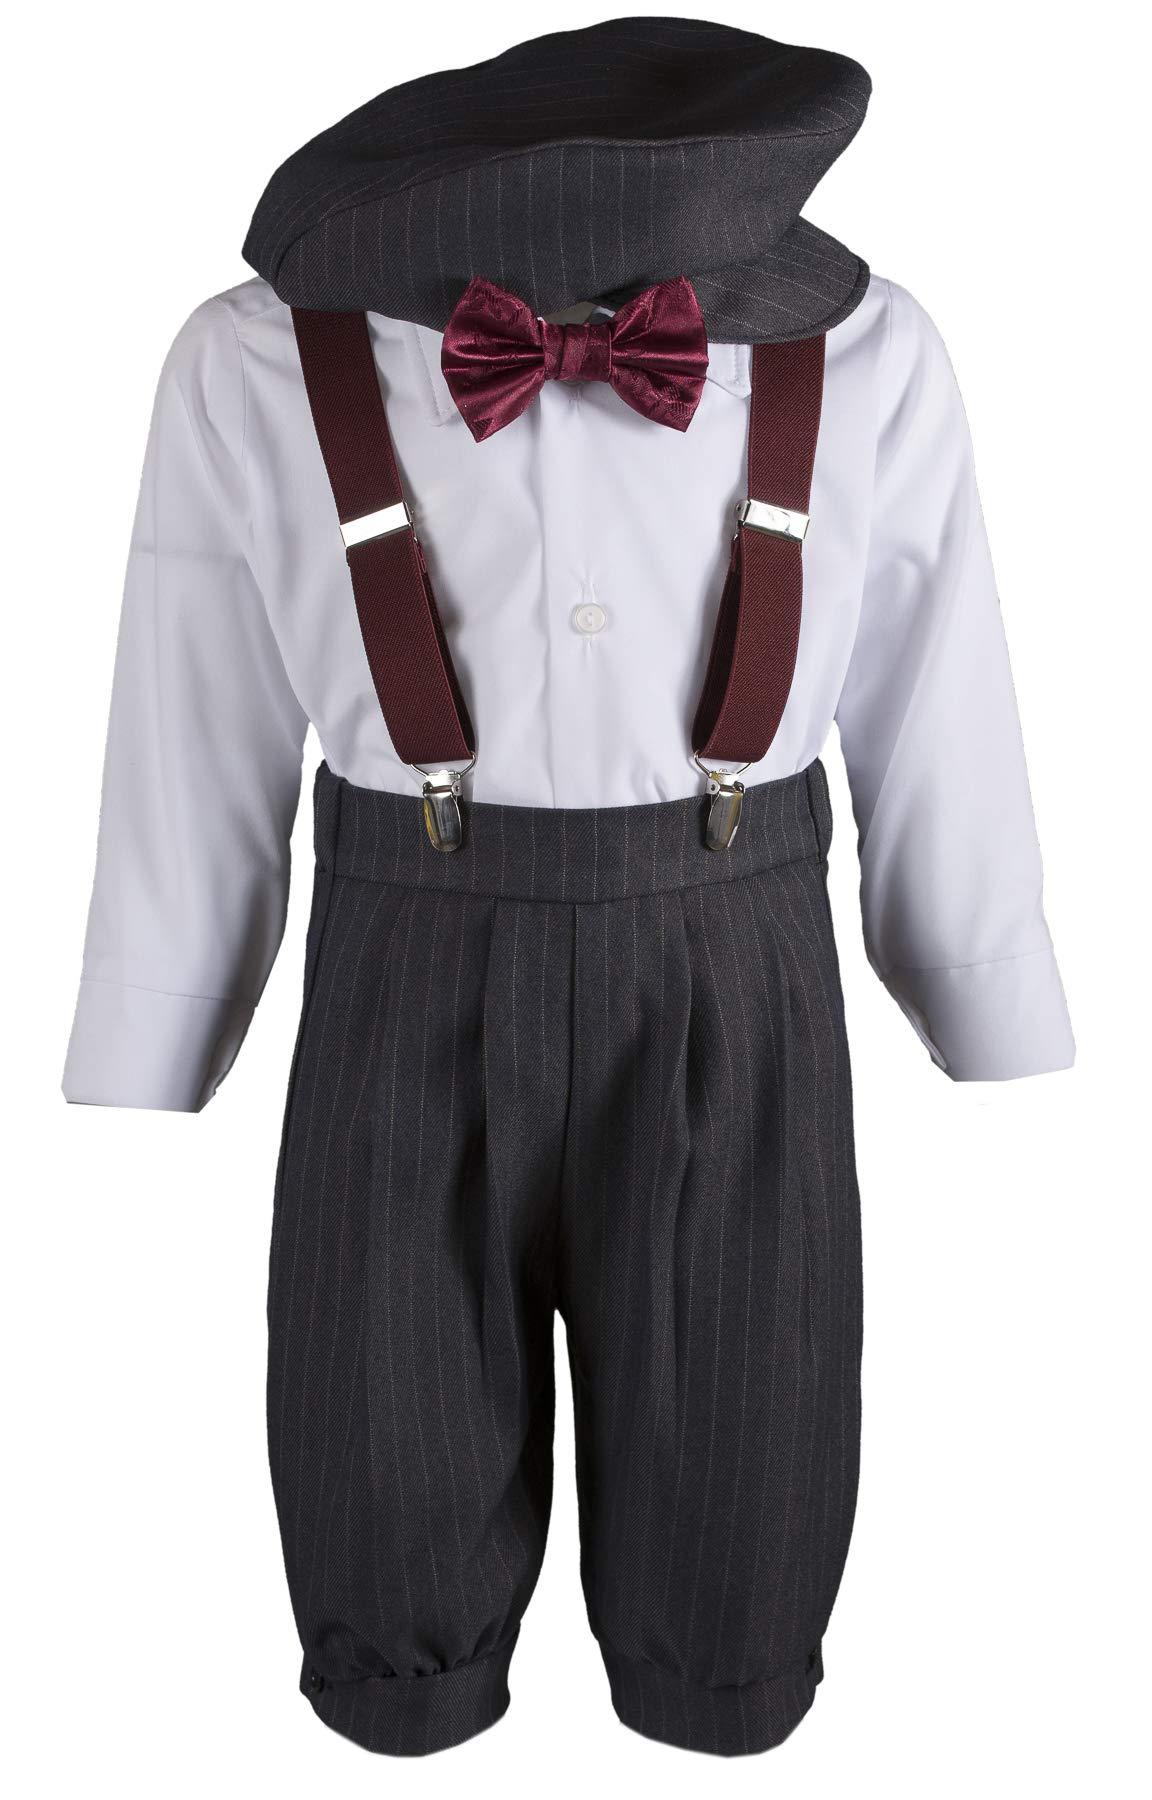 Tuxgear Boys Grey Knickers Pageboy Cap with Burgundy Rose Bow Tie & Suspenders (7B)